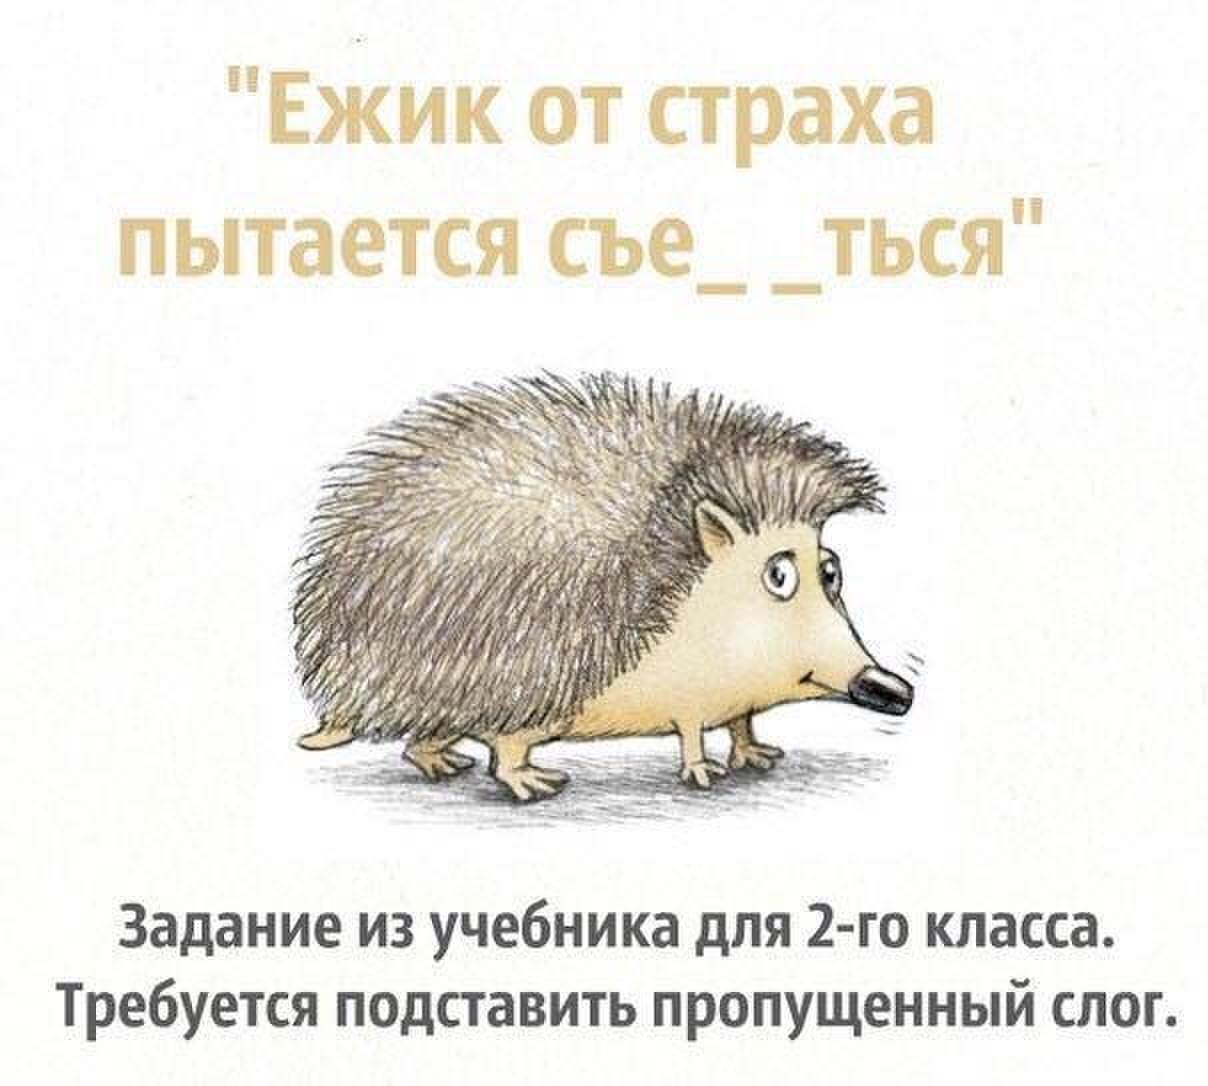 http://s00.yaplakal.com/pics/pics_original/4/1/5/8406514.jpg